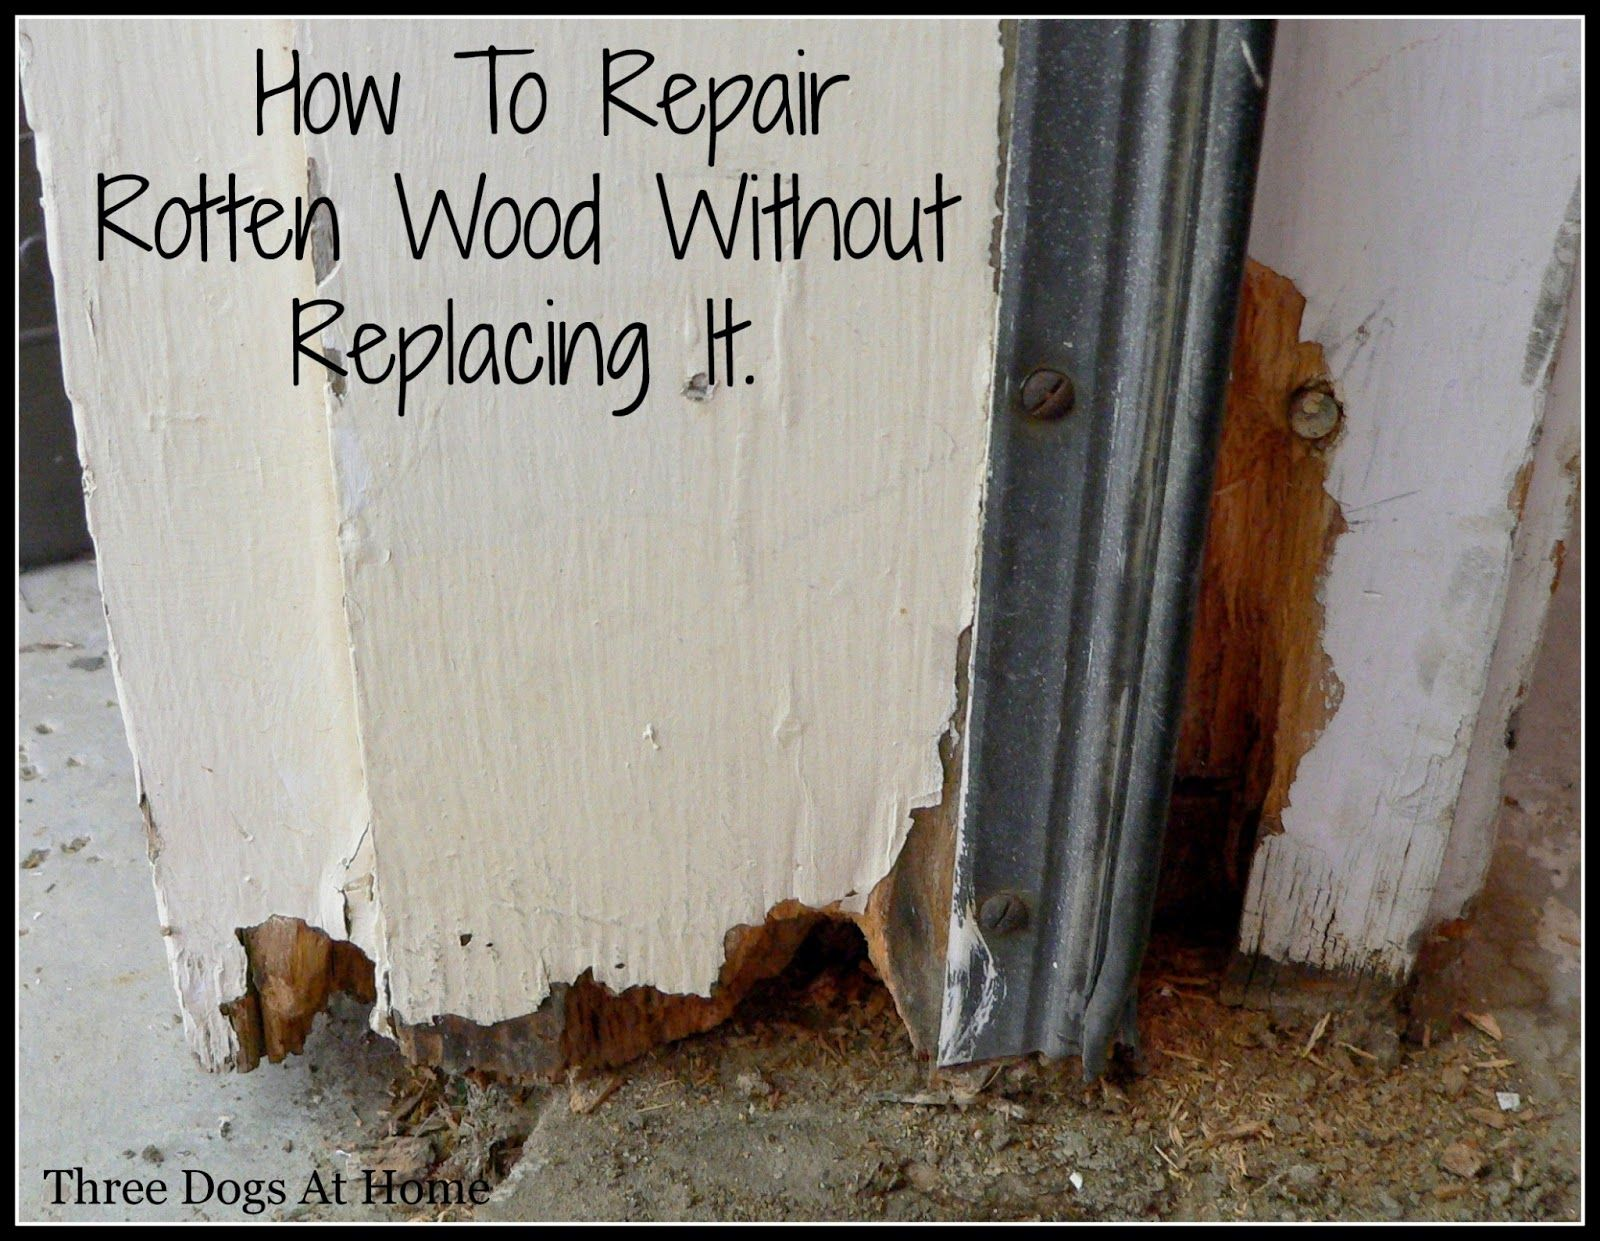 Three Dogs At Home  Diy home repair, Home repairs, Home appraisal